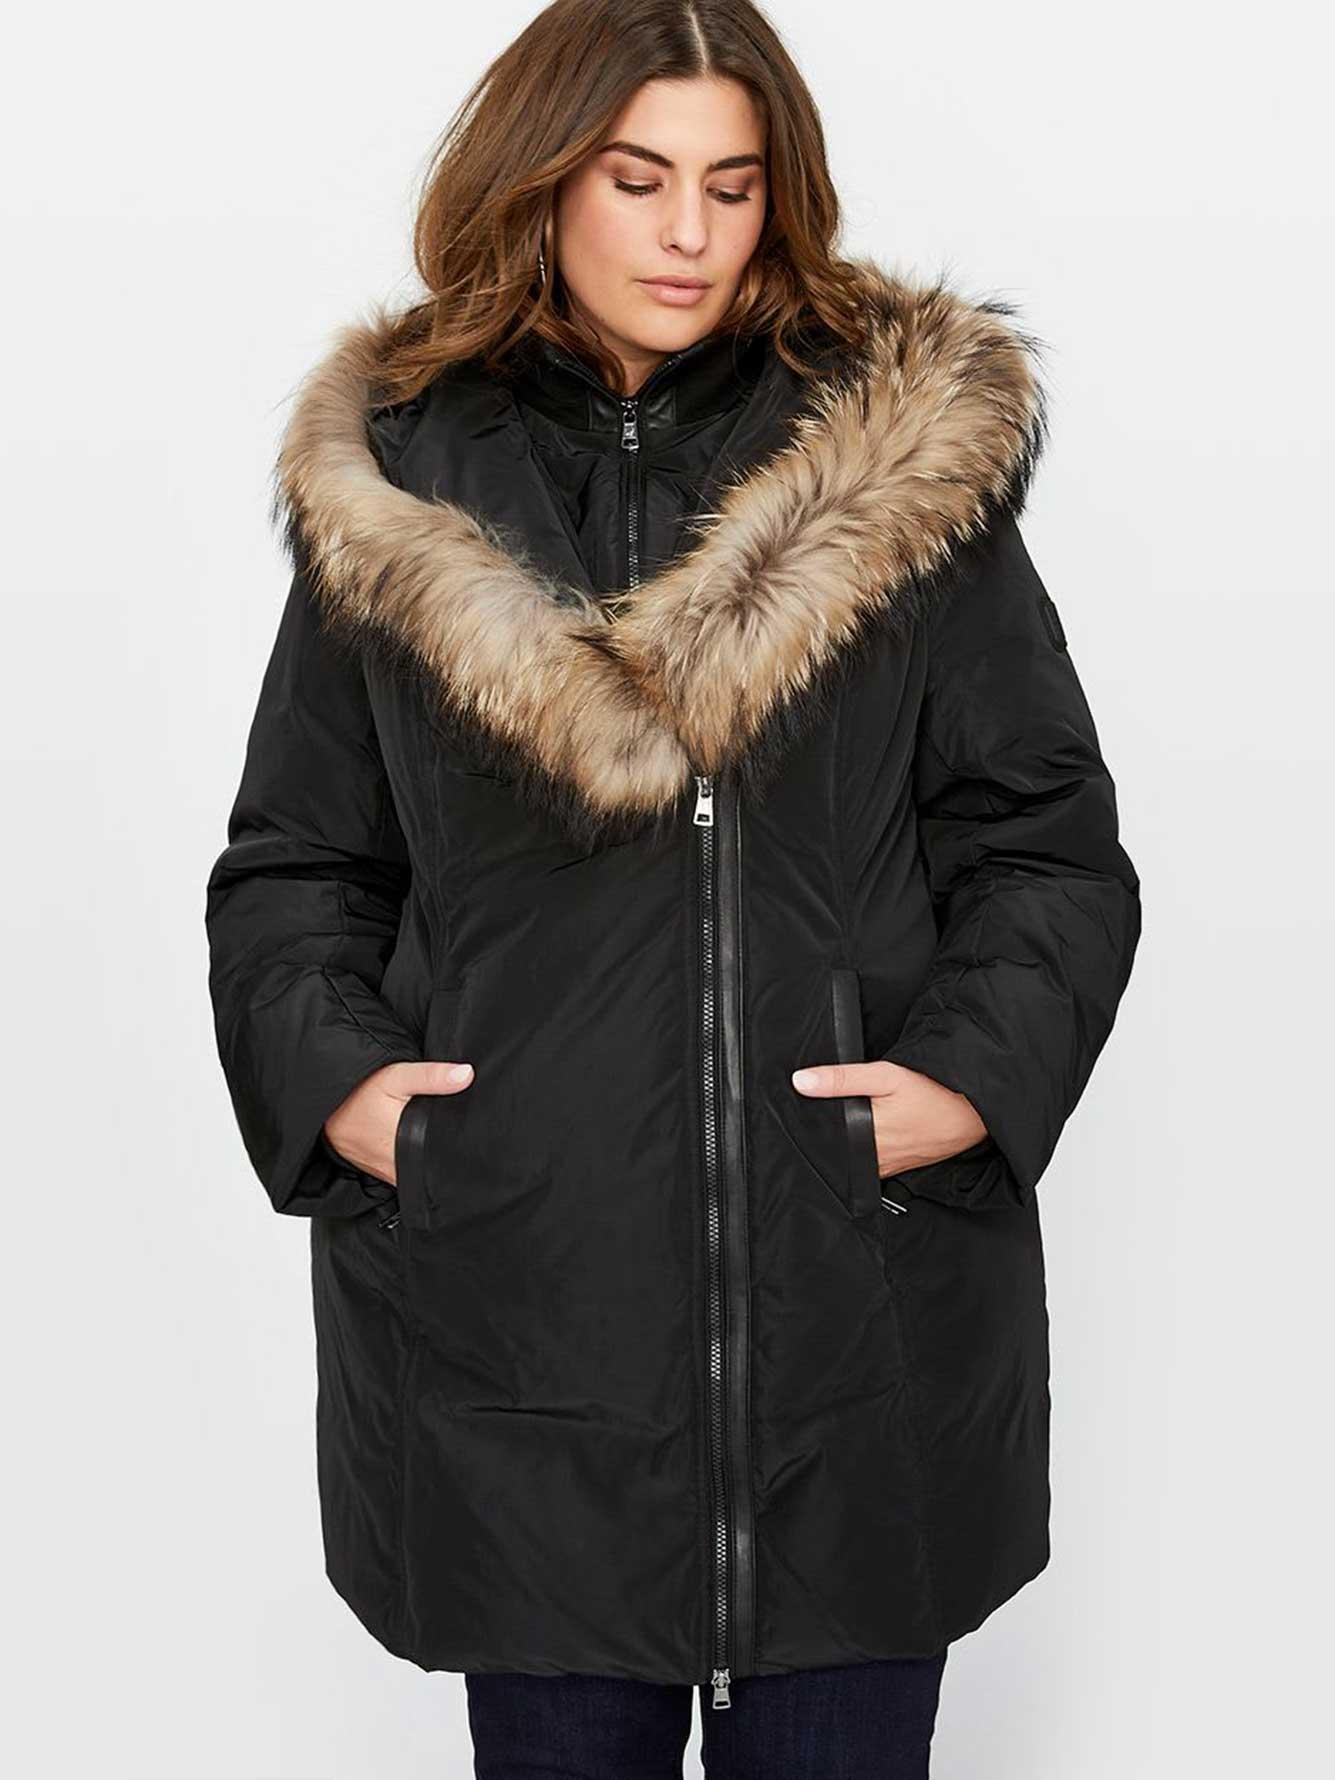 79036 as well Urban Mist Soft Shaggy Faux Fur Coat Jacket P1018 as well 771398 as well Pink Fluffy Jacket 5114 further 110844154716. on c1051